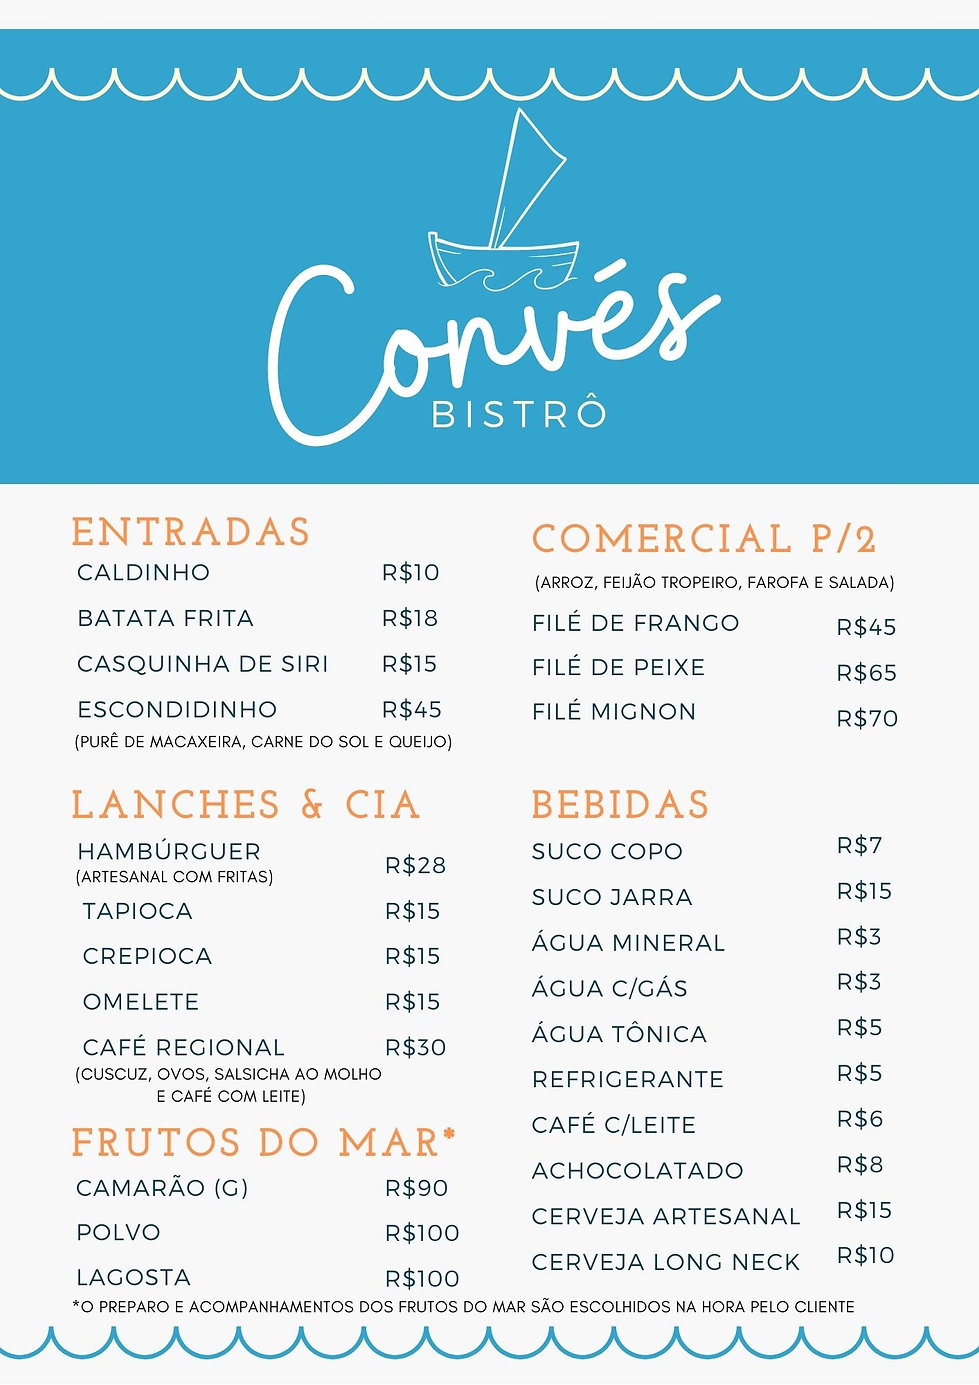 CARDÁPIO CONVÉS.jpg